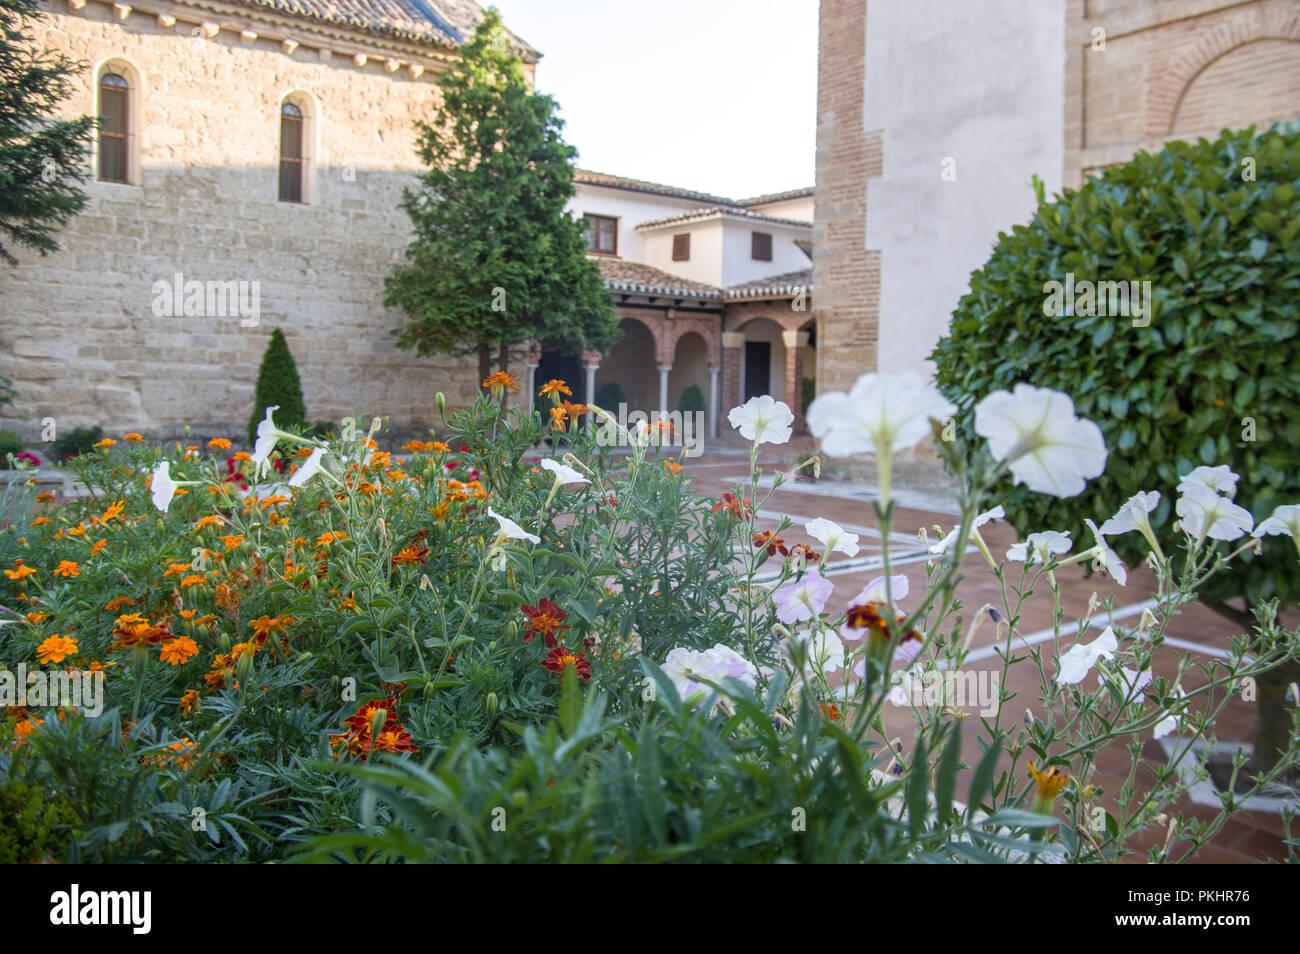 Flowers in the convent of Santa Clara, Astudillo. Palencia province, Castilla-León, Spain - Stock Image